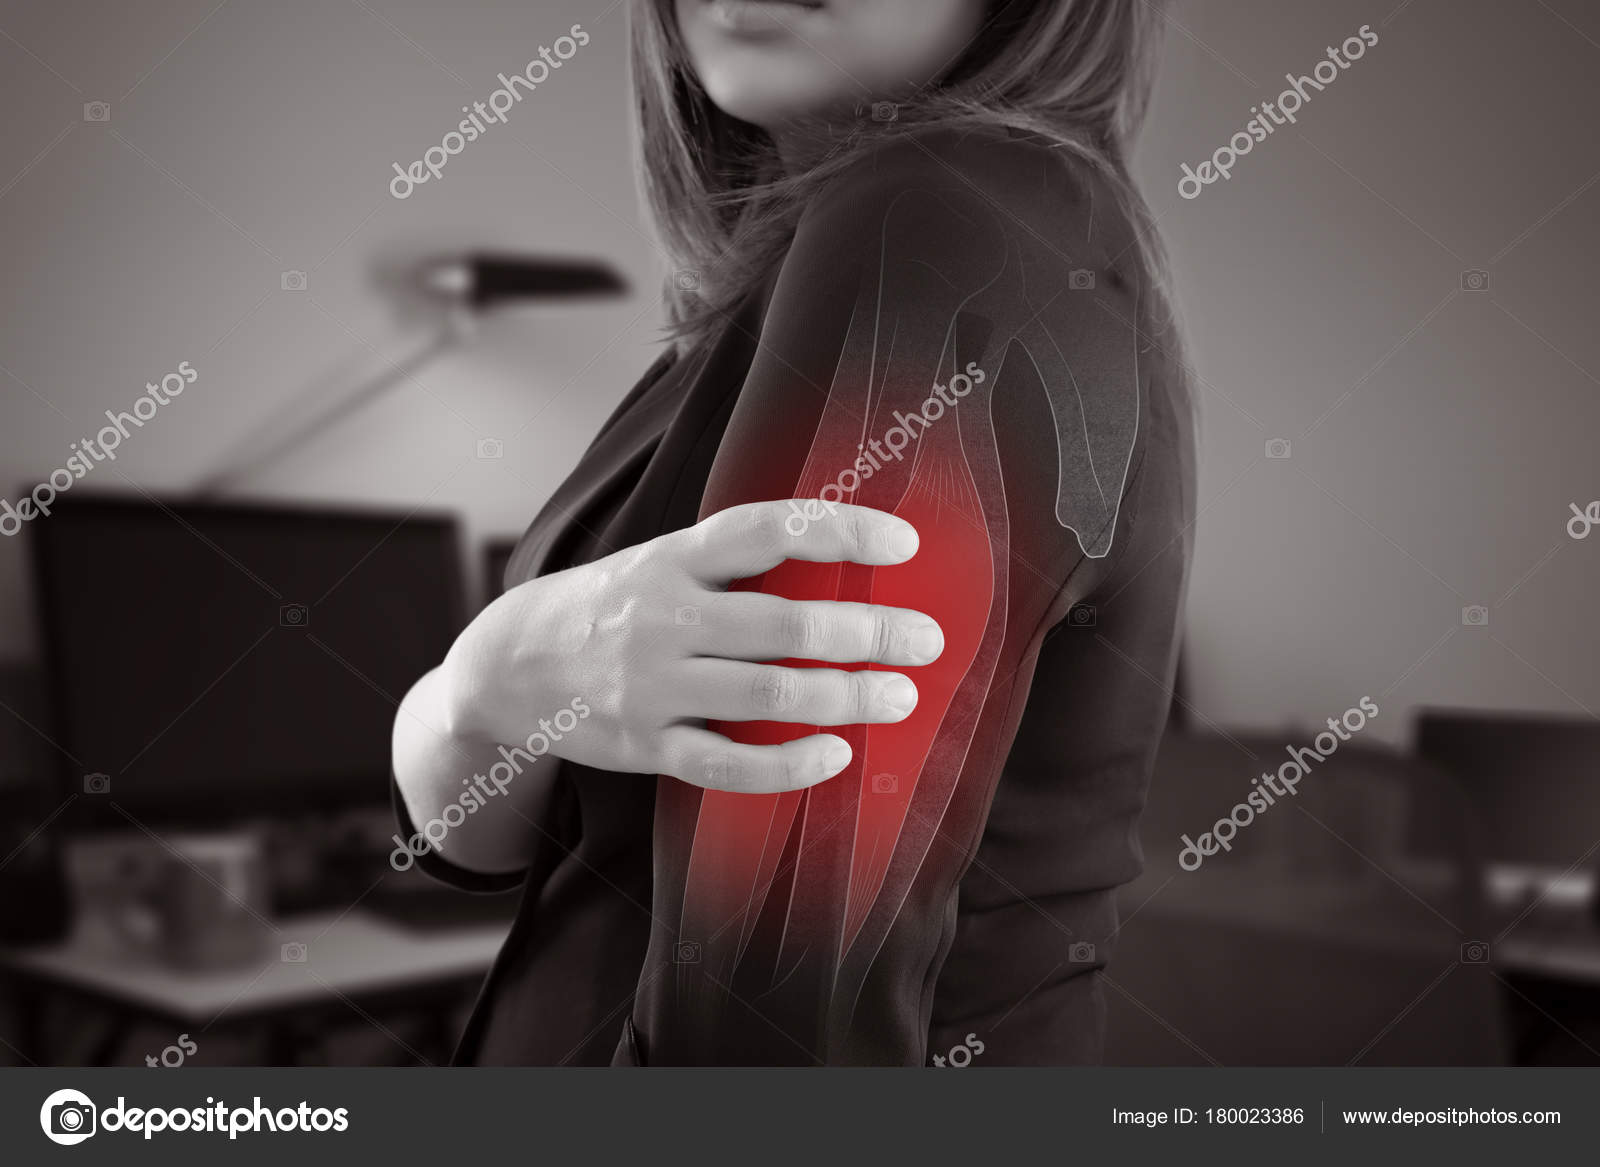 Frau mit Oberarm Schmerzen — Stockfoto © Tharakorn #180023386